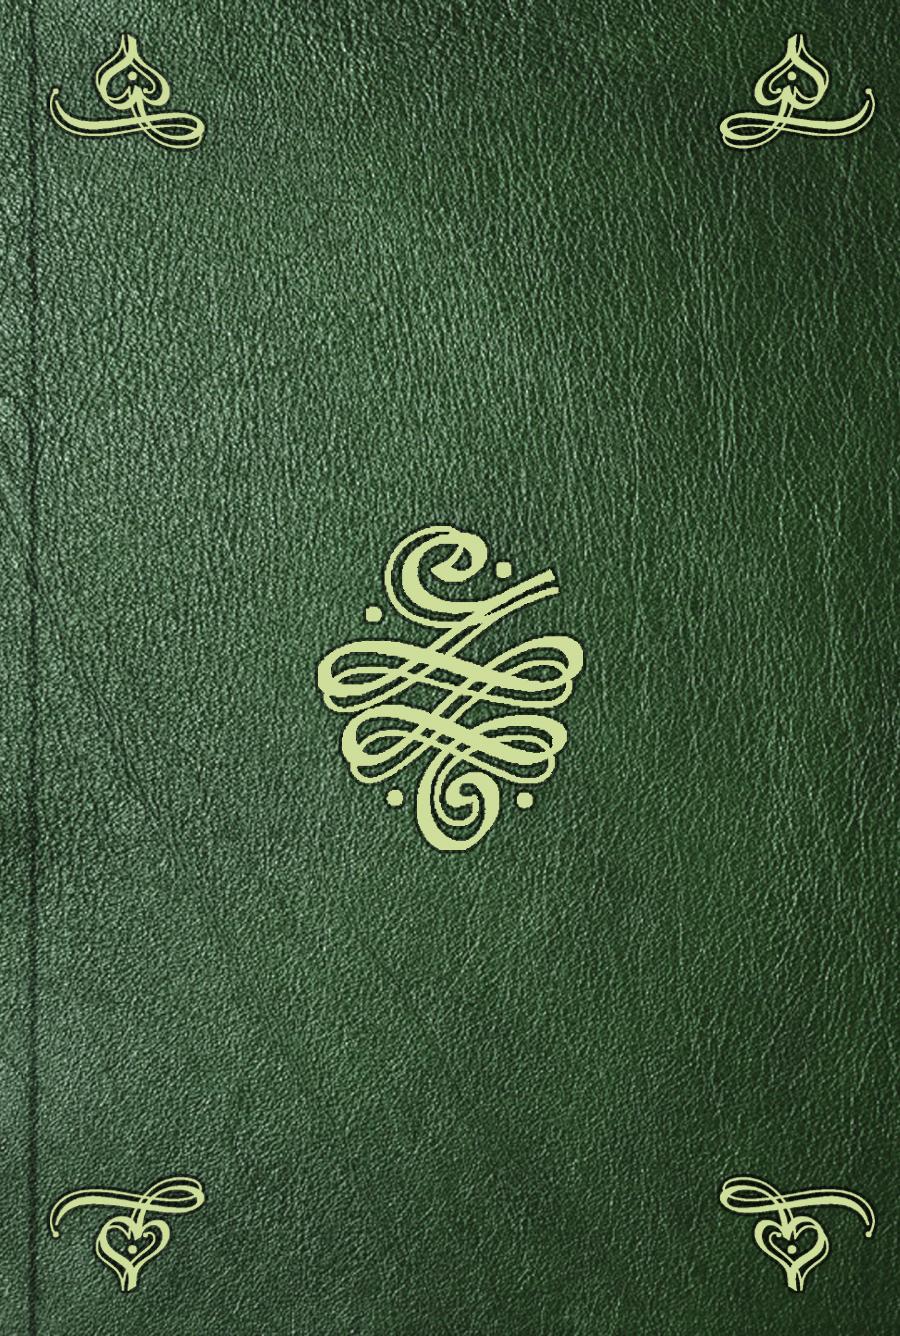 Johann Jakob Engel J. J. Engel's Schriften. Bd. 8. Mimik. T. 2 johann jakob engel der philosoph für die welt t 2